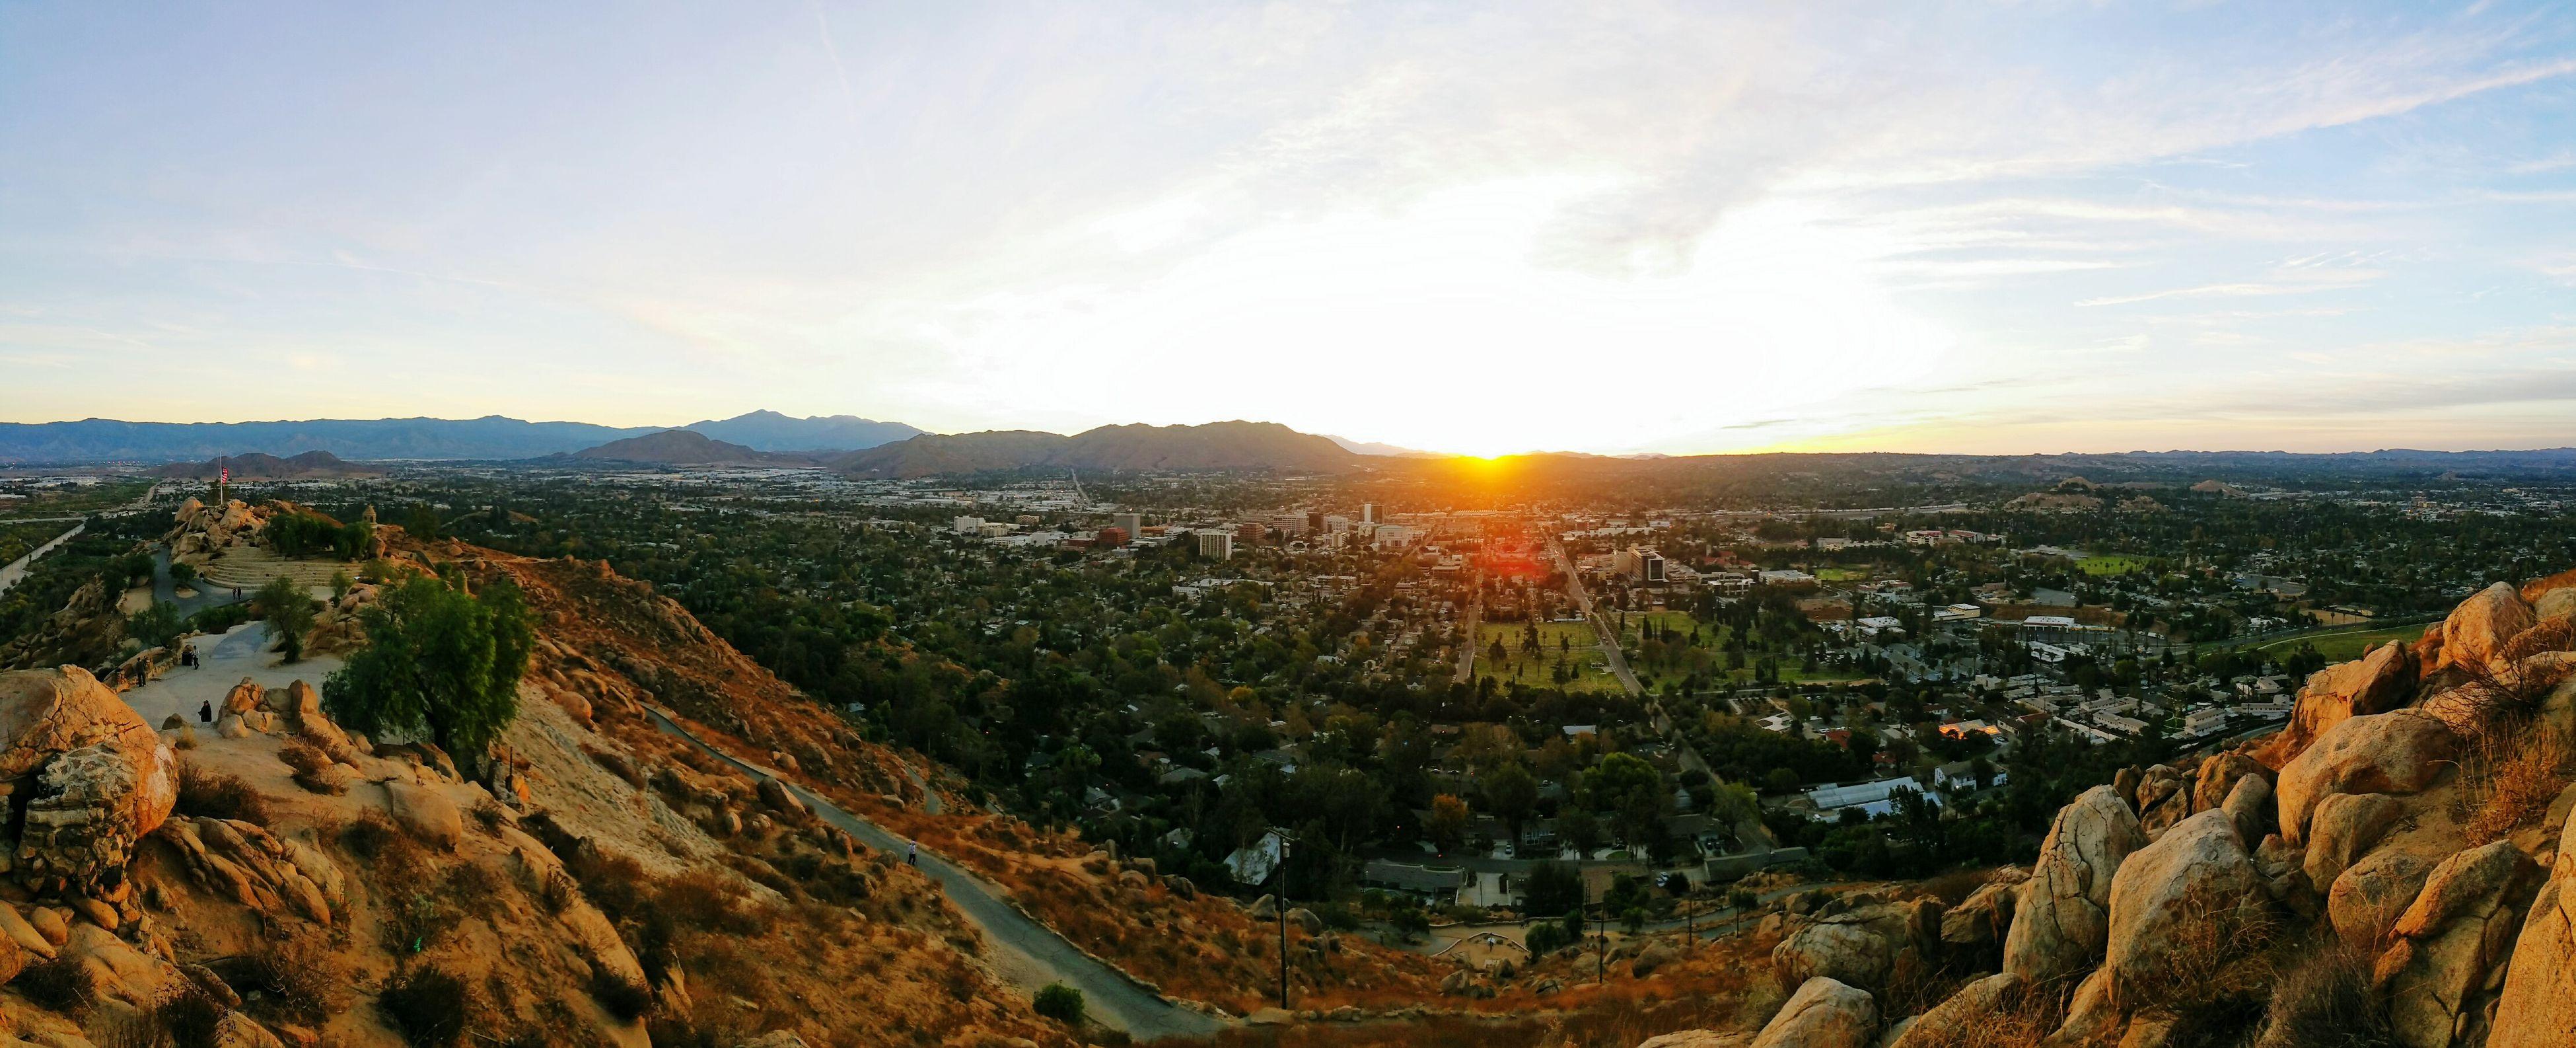 Hiking Nature Outdoors Riverside, California Mt. Rubidoux Sunrise Beauty In Nature